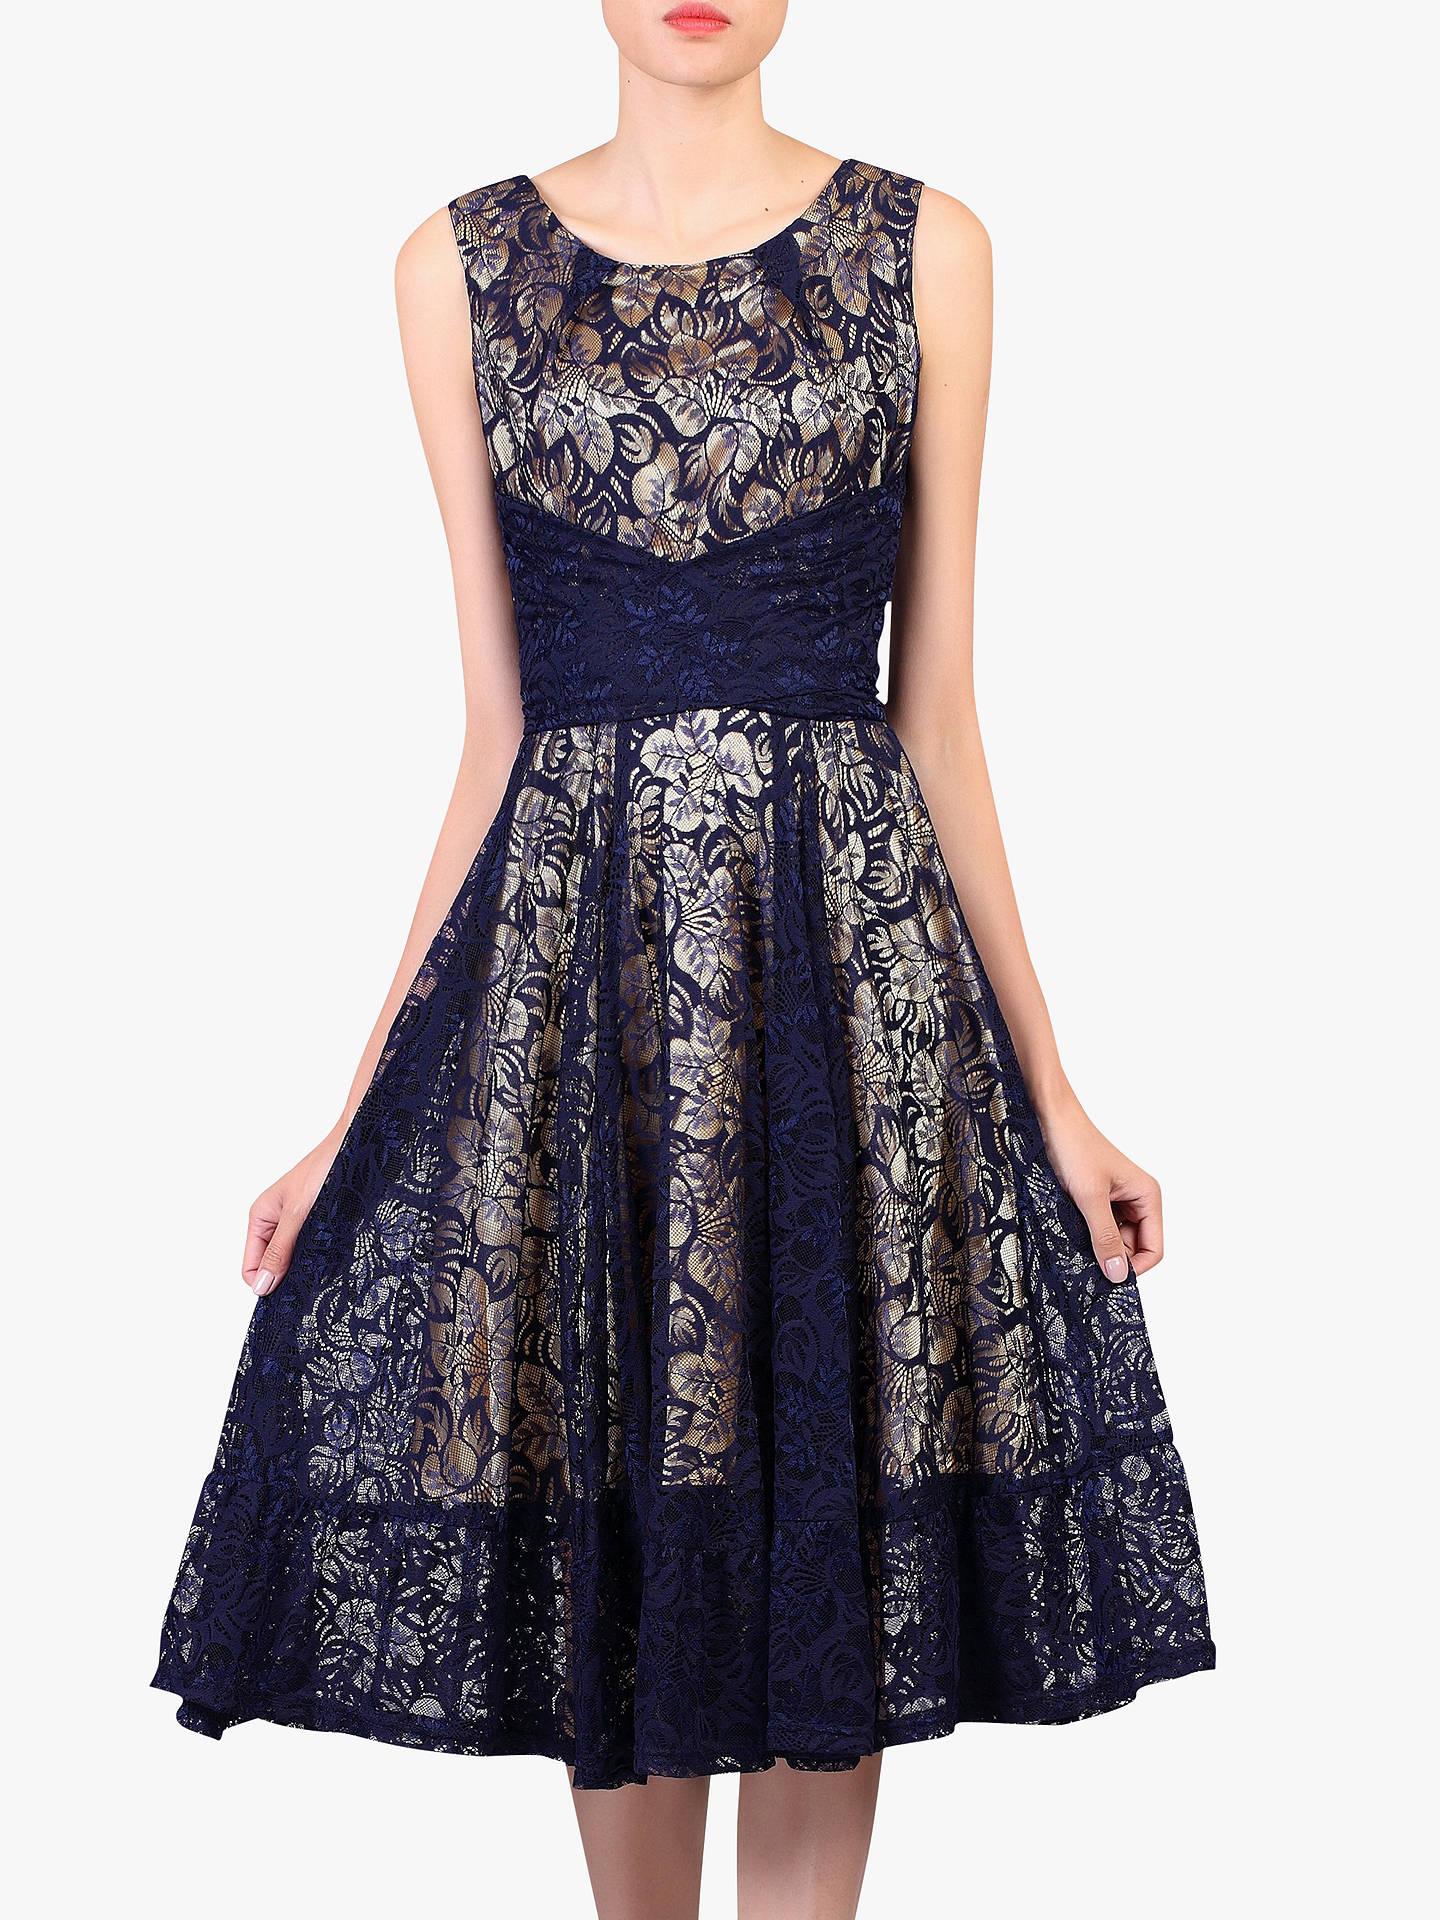 4ff1f3ba Buy Jolie Moi Contrast Lace Dress, Navy, 8 Online at johnlewis.com ...